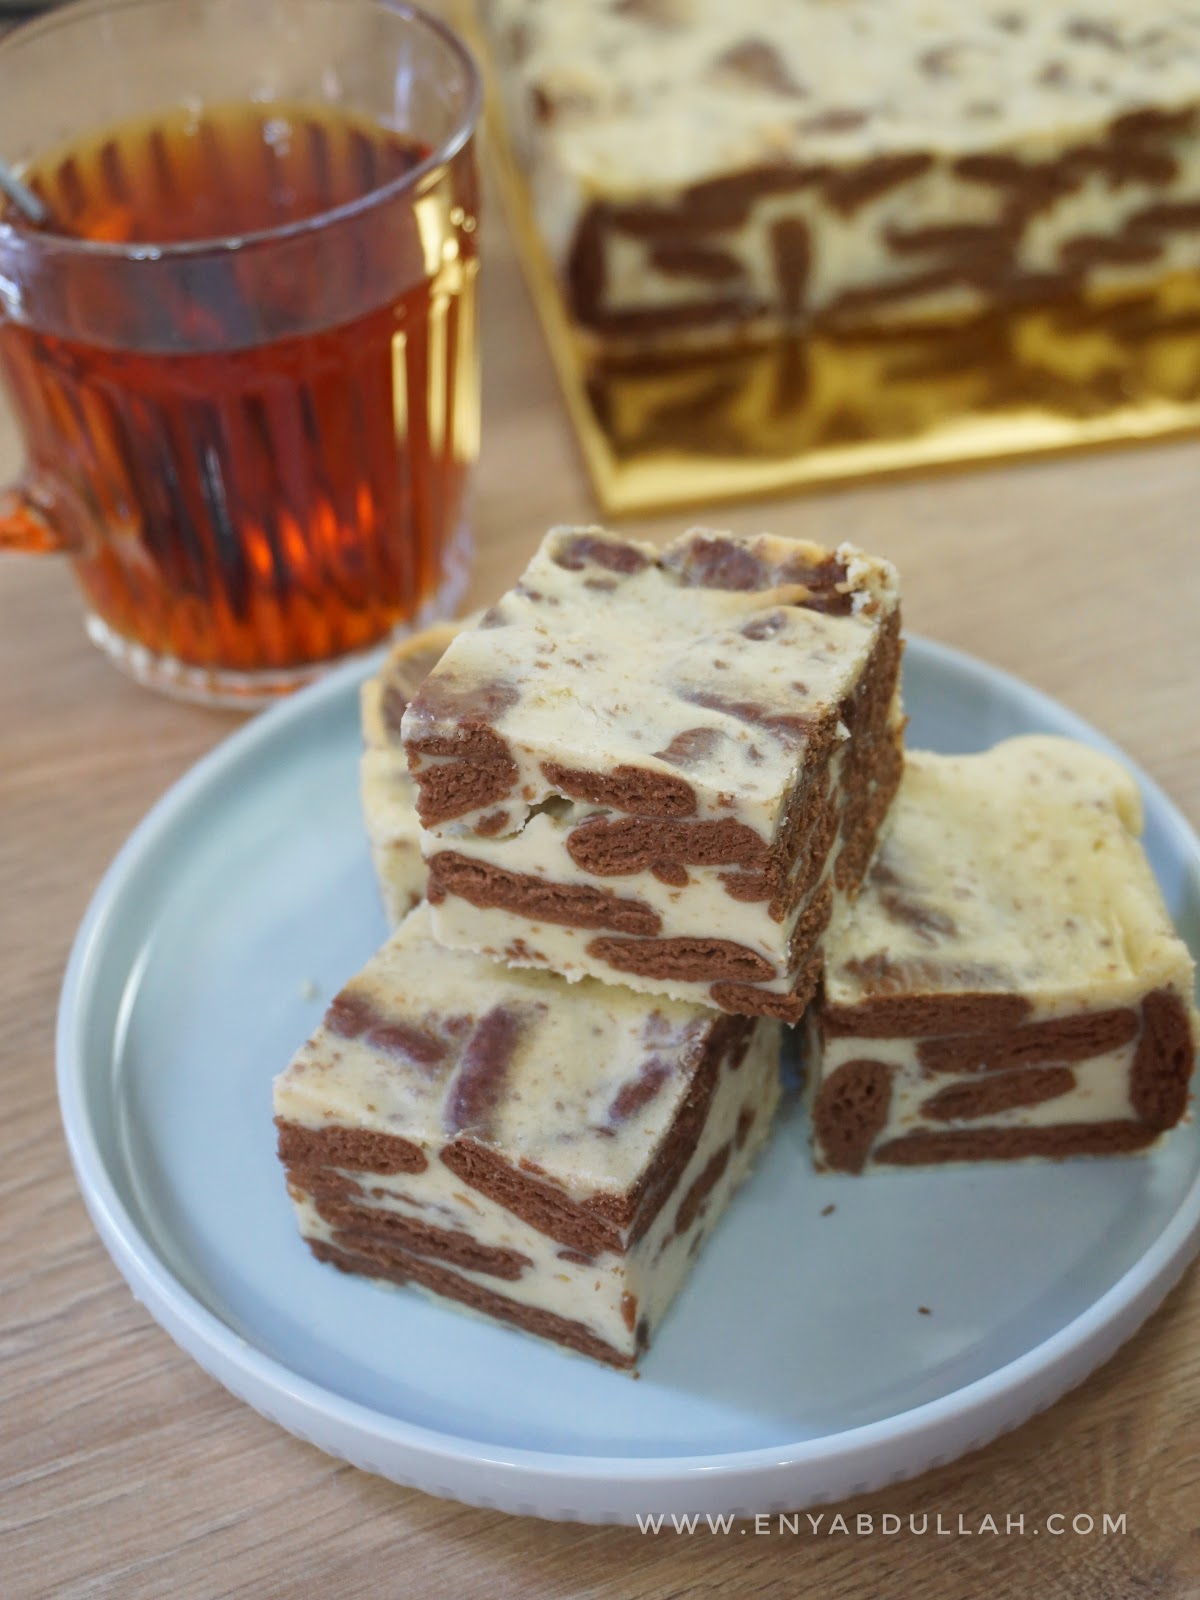 Kek batik cheese, batik cheesecake, resepi kek batik sedap, cara mudah buat kek batik